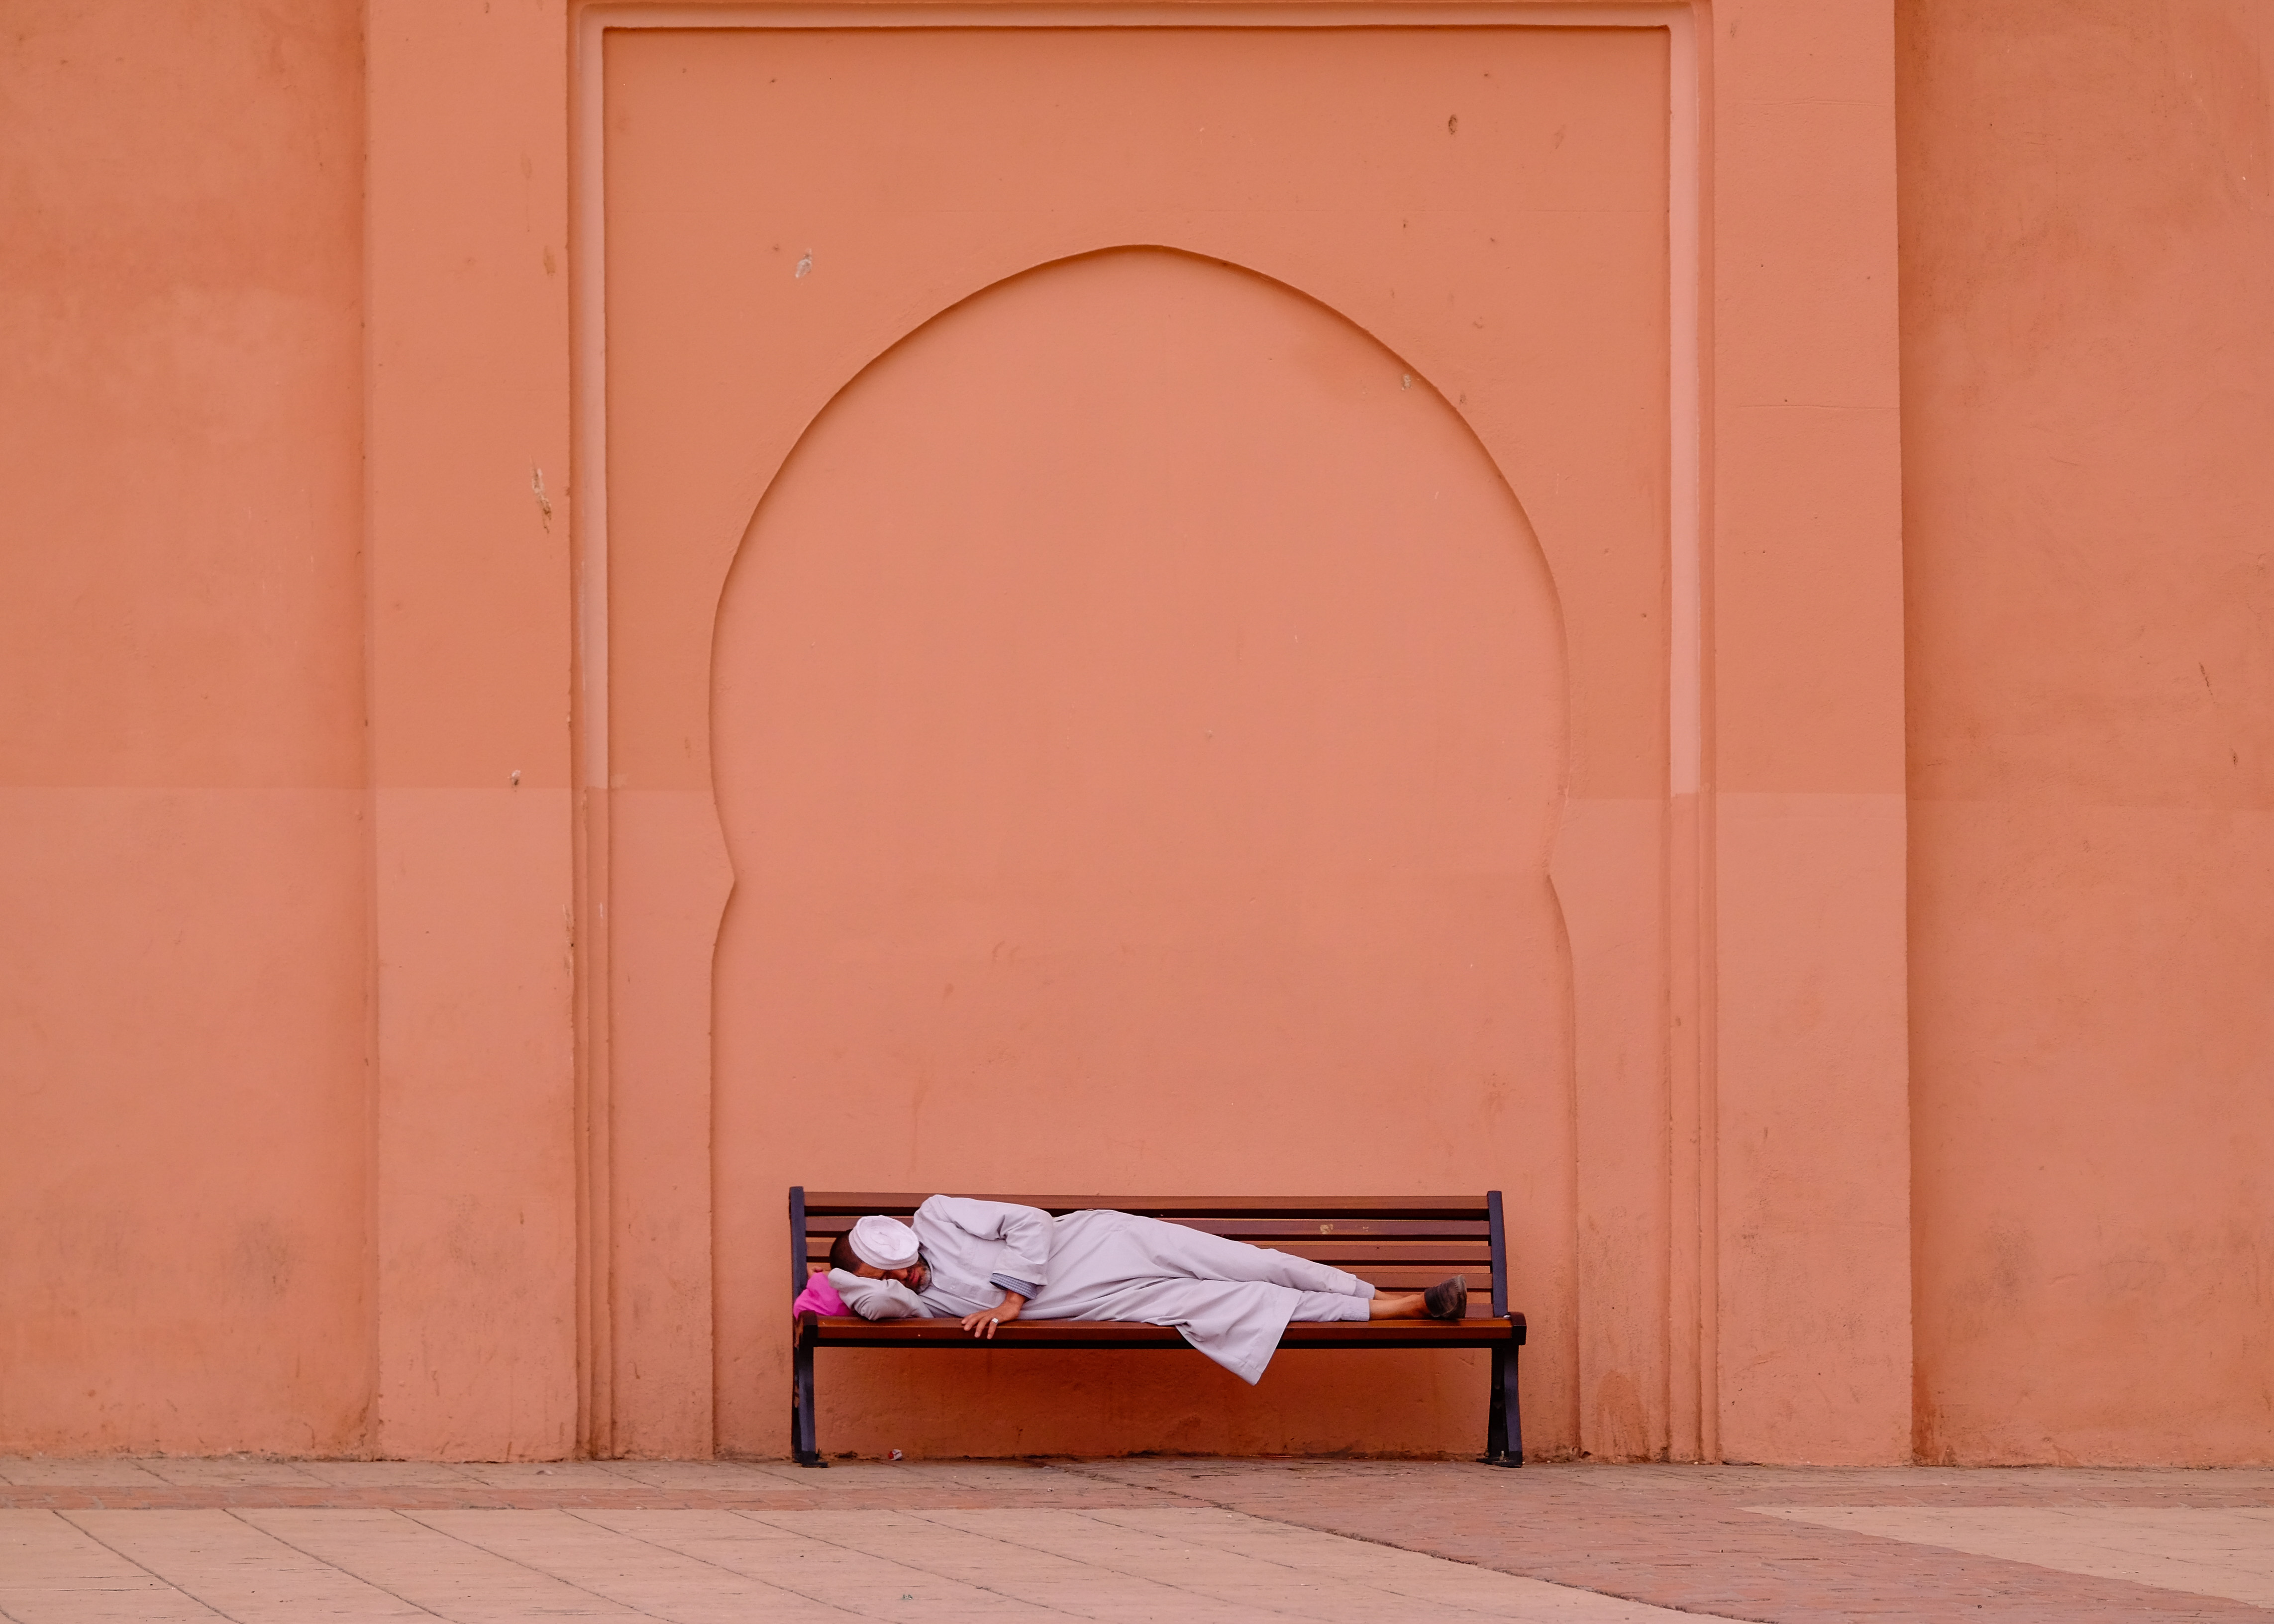 Maroc (9 of 20)